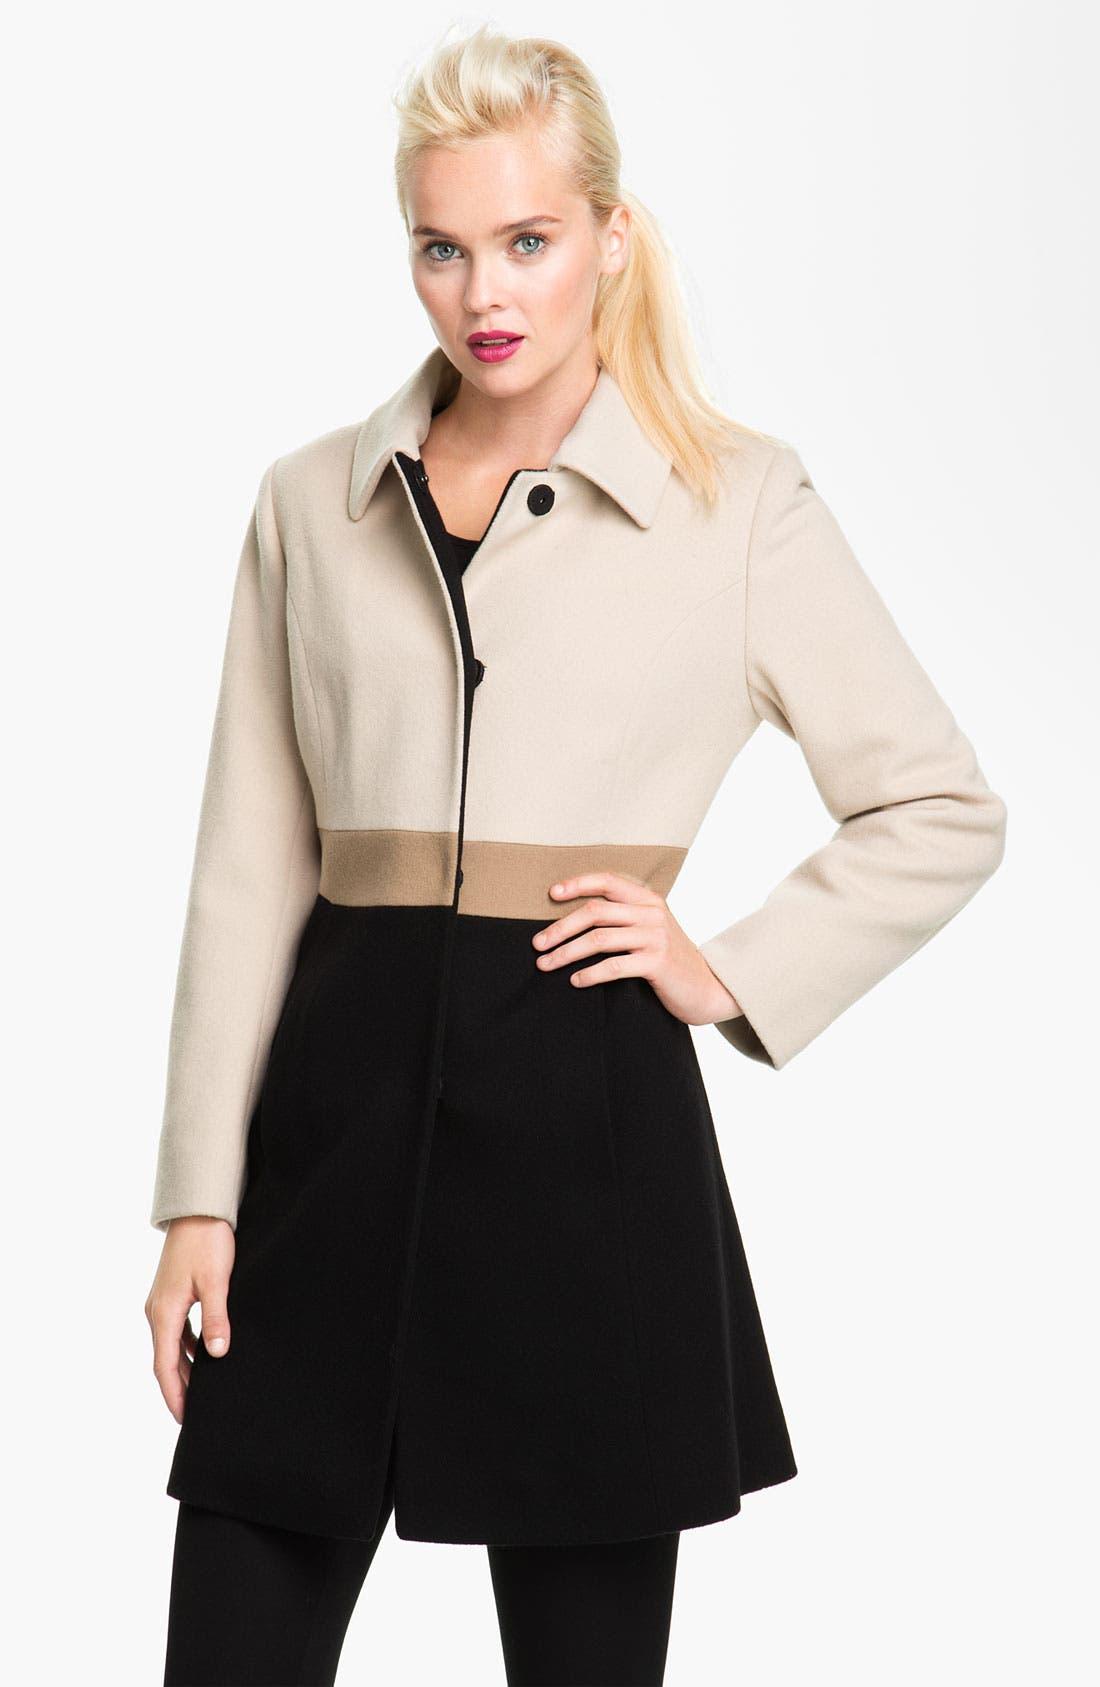 Alternate Image 1 Selected - Fleurette Colorblock Wool Walking Coat (Petite)